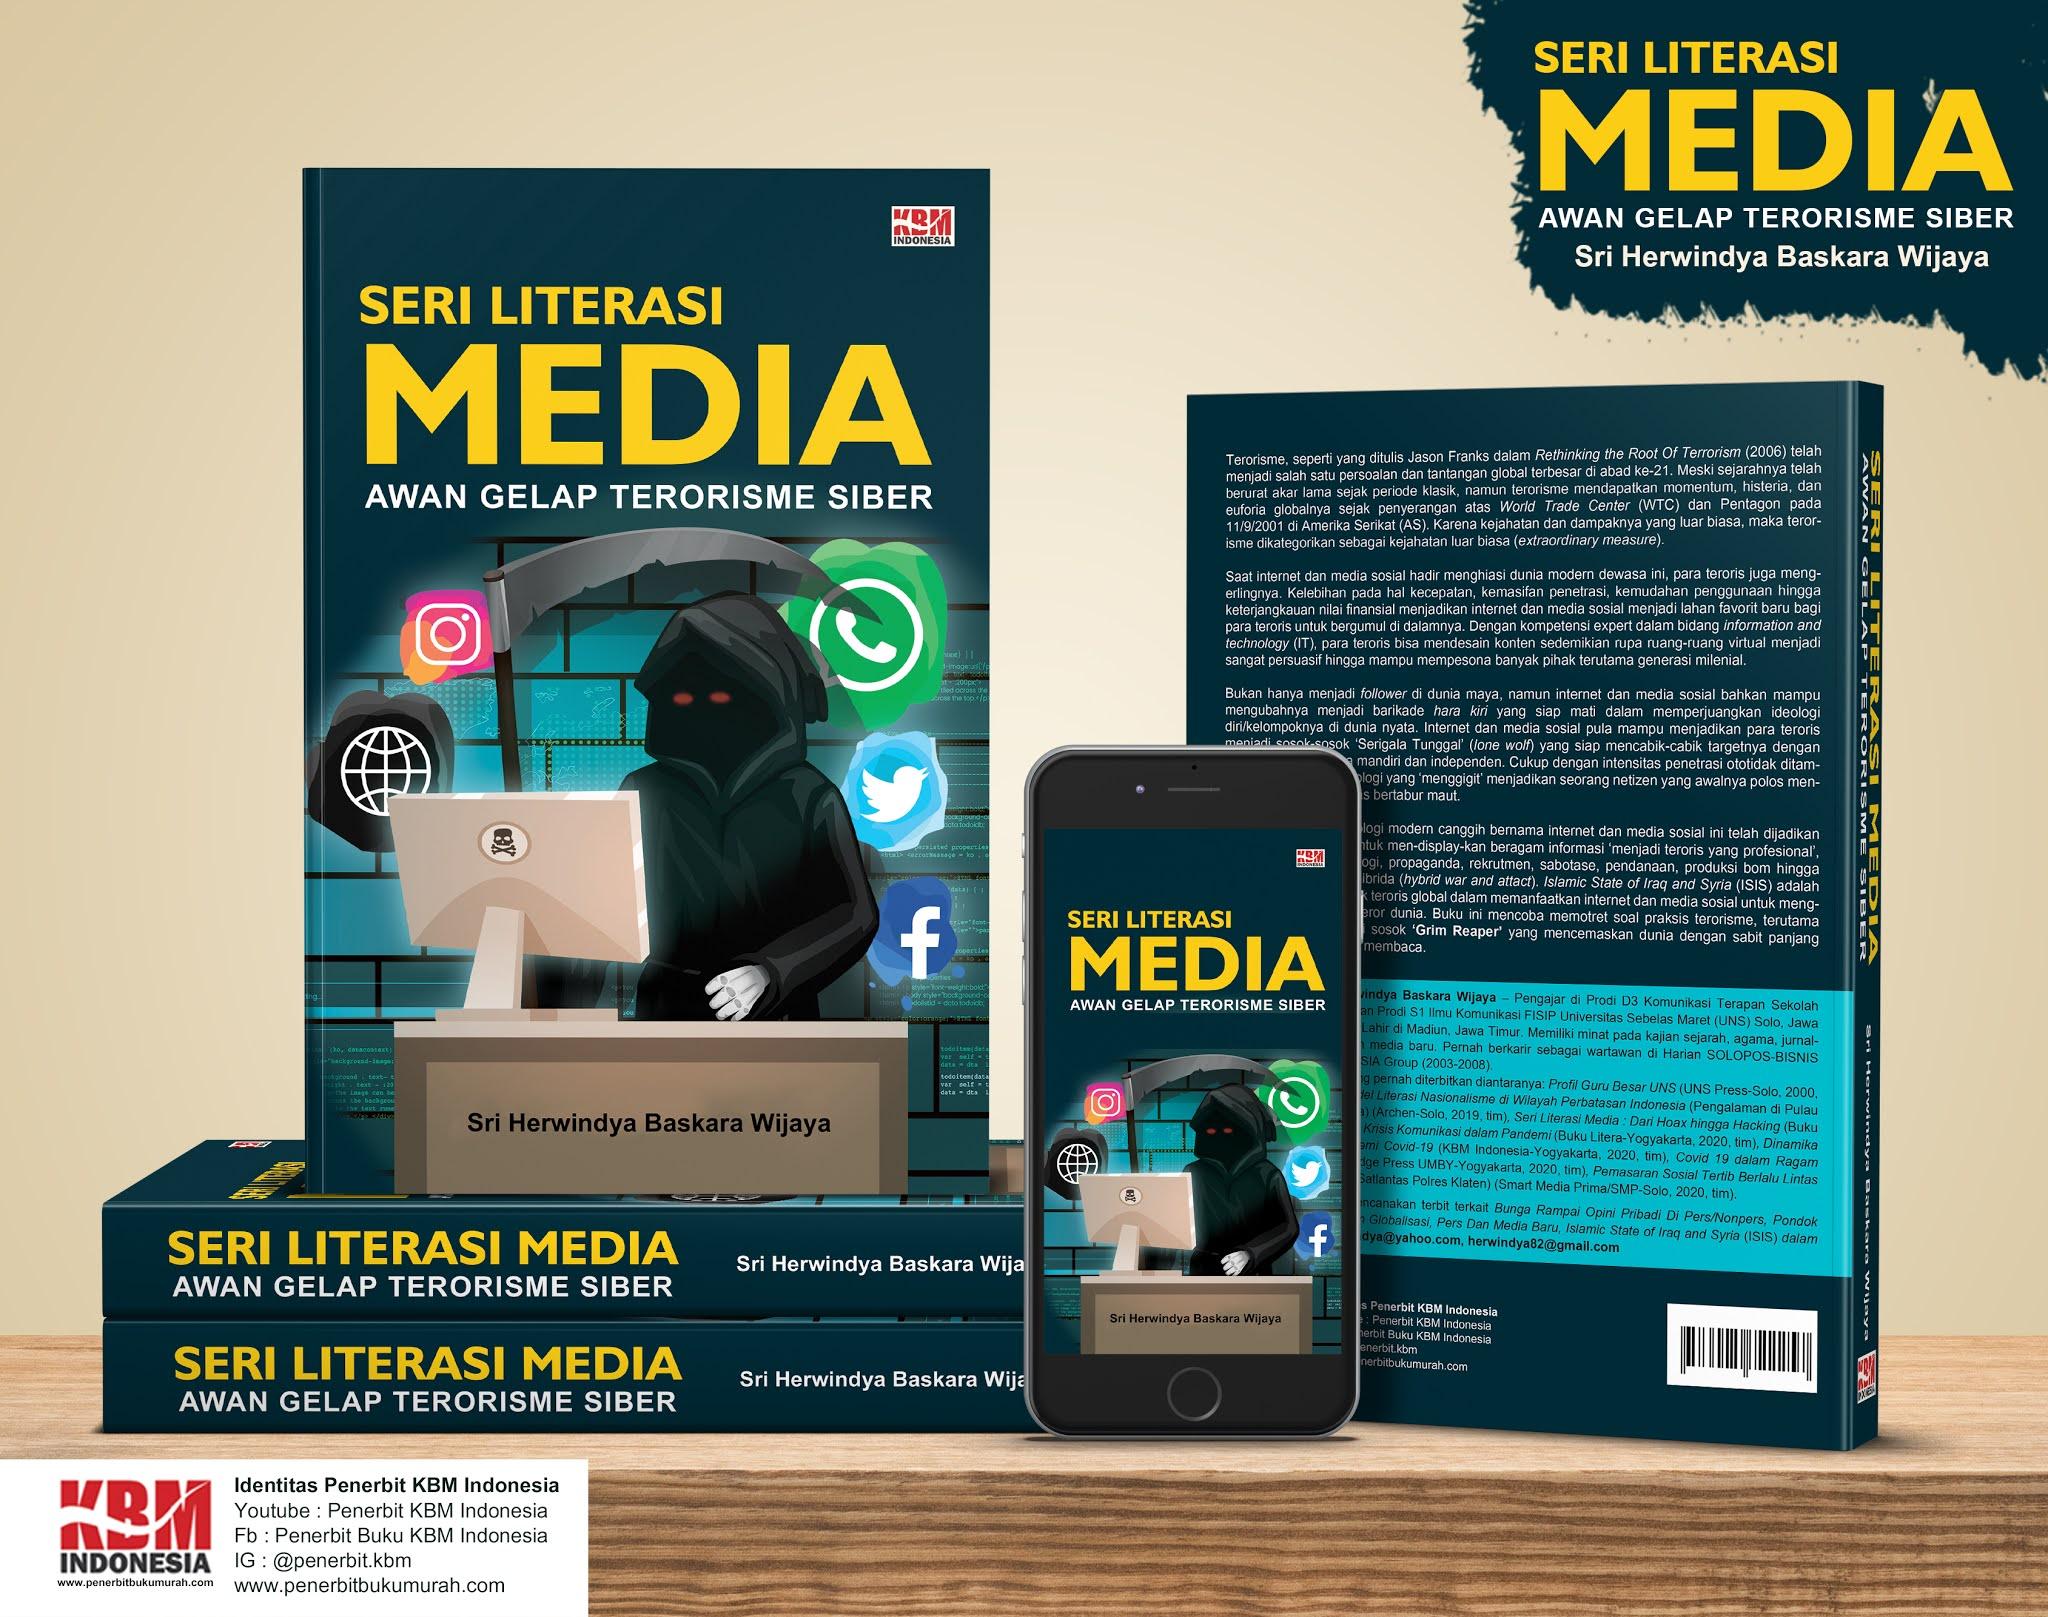 SERI LITERASI MEDIA : AWAN GELAP TERORISME SIBER